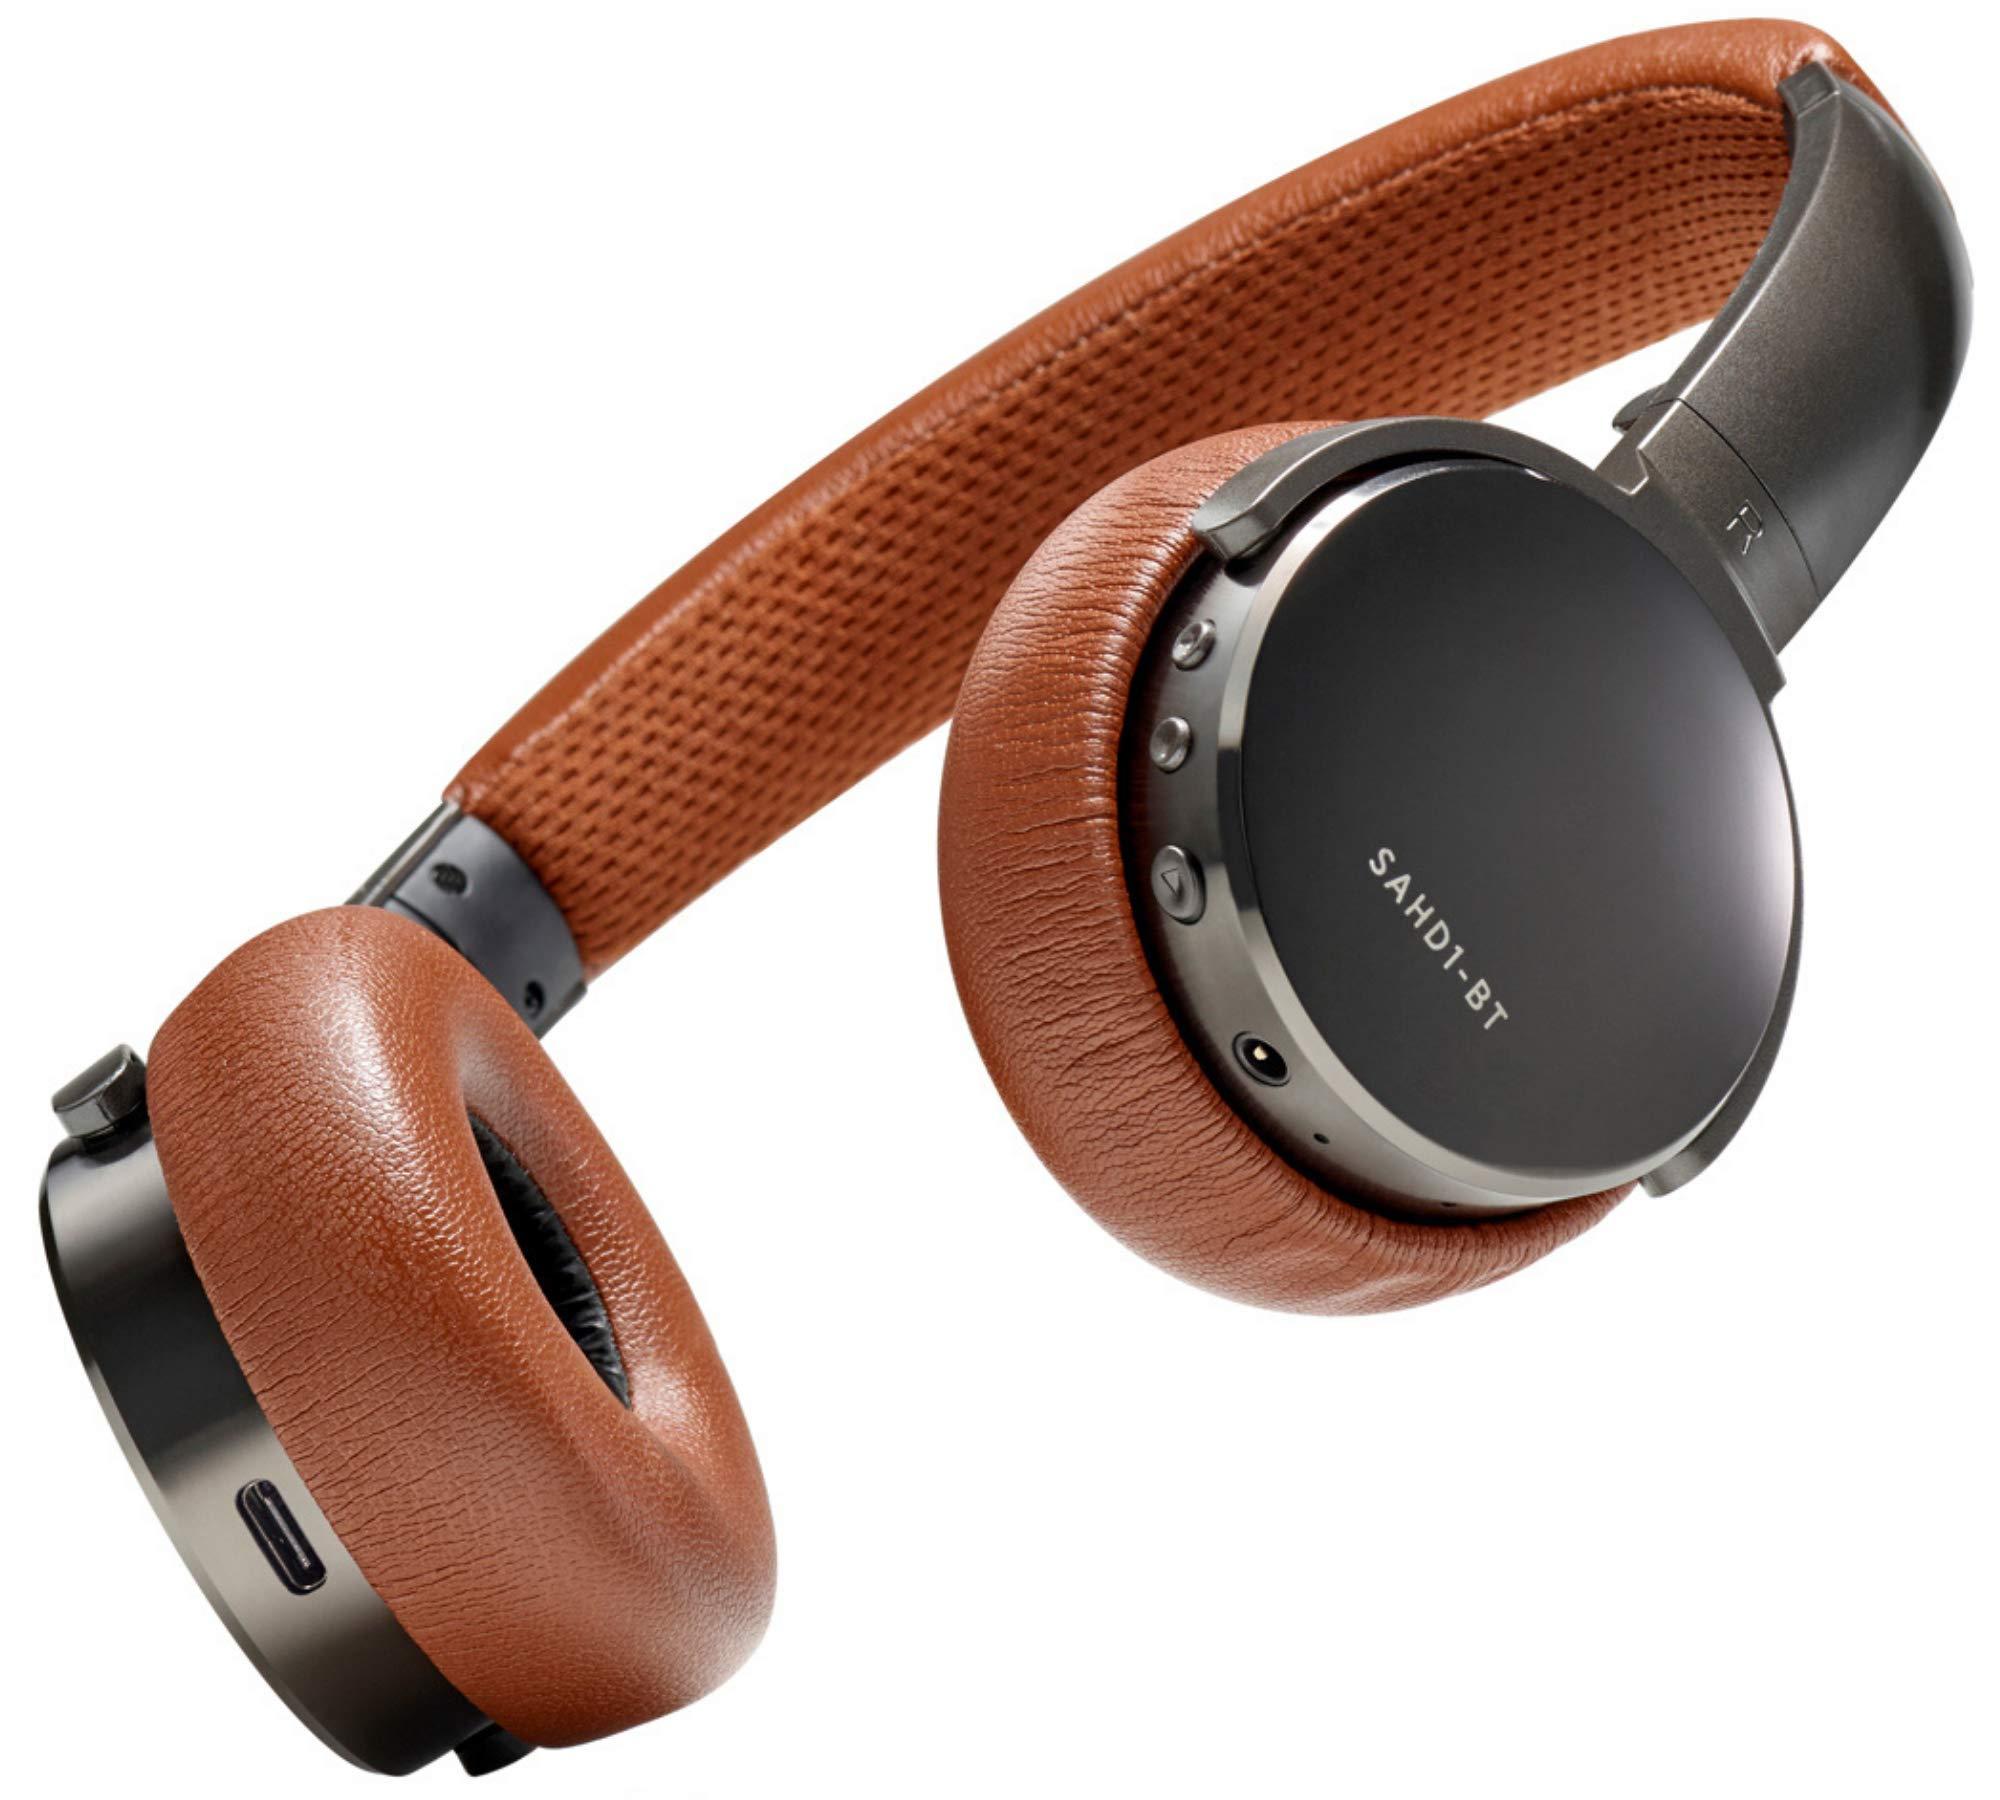 Status Audio BT One Wireless On-Ear Headphones - Bluetooth 5.0. + aptX, 30 Hours of Battery, USB-C + Quick Charge, Award Winning Sound + Minimalist Metal Design, Gunmetal Grey + Brown (Umber)